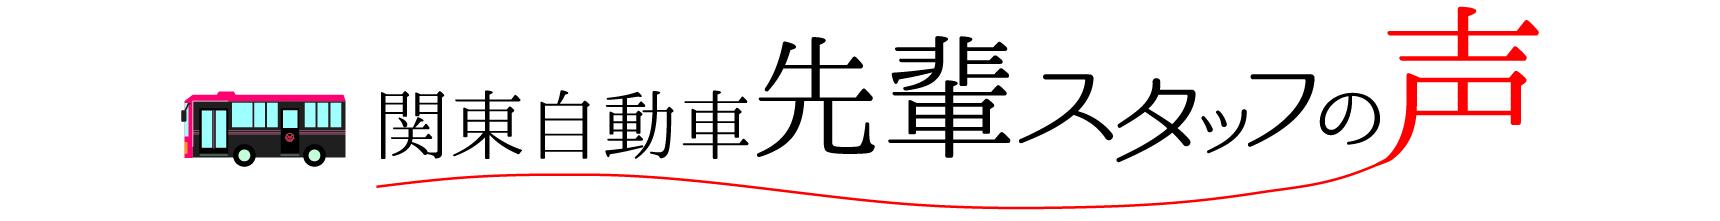 kanto_voice.jpg